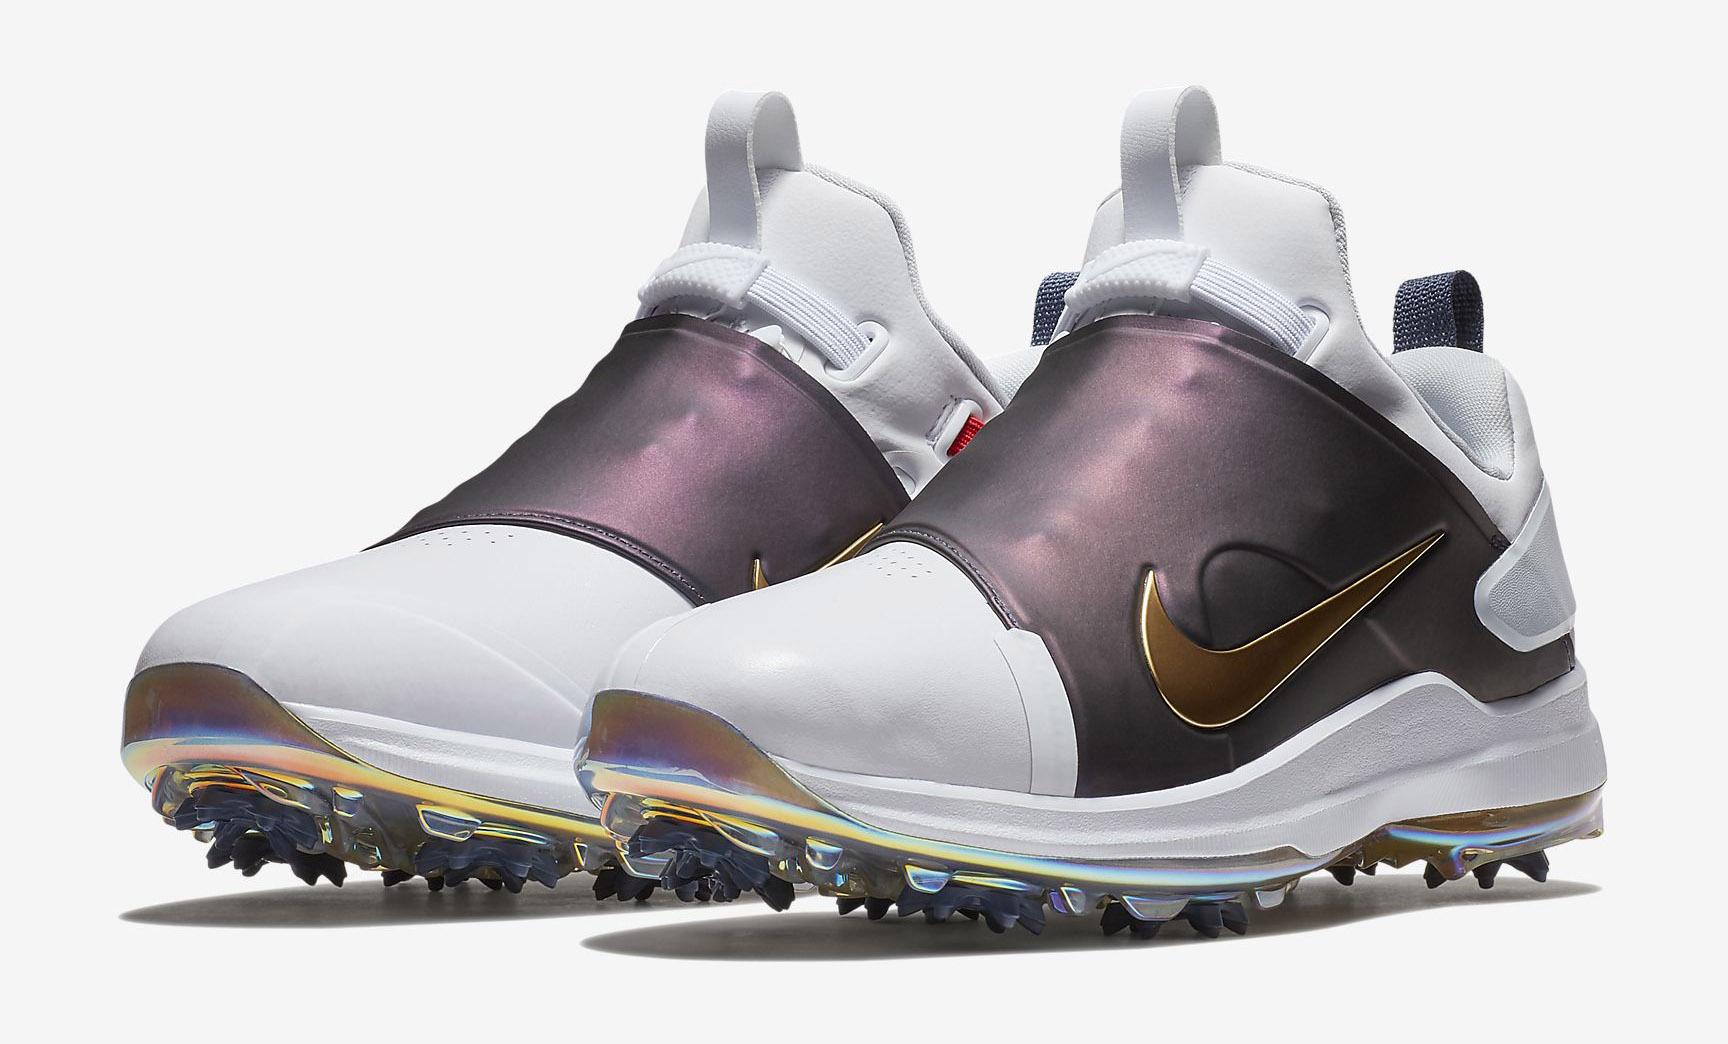 Nike Unveils Limited Edition Tour